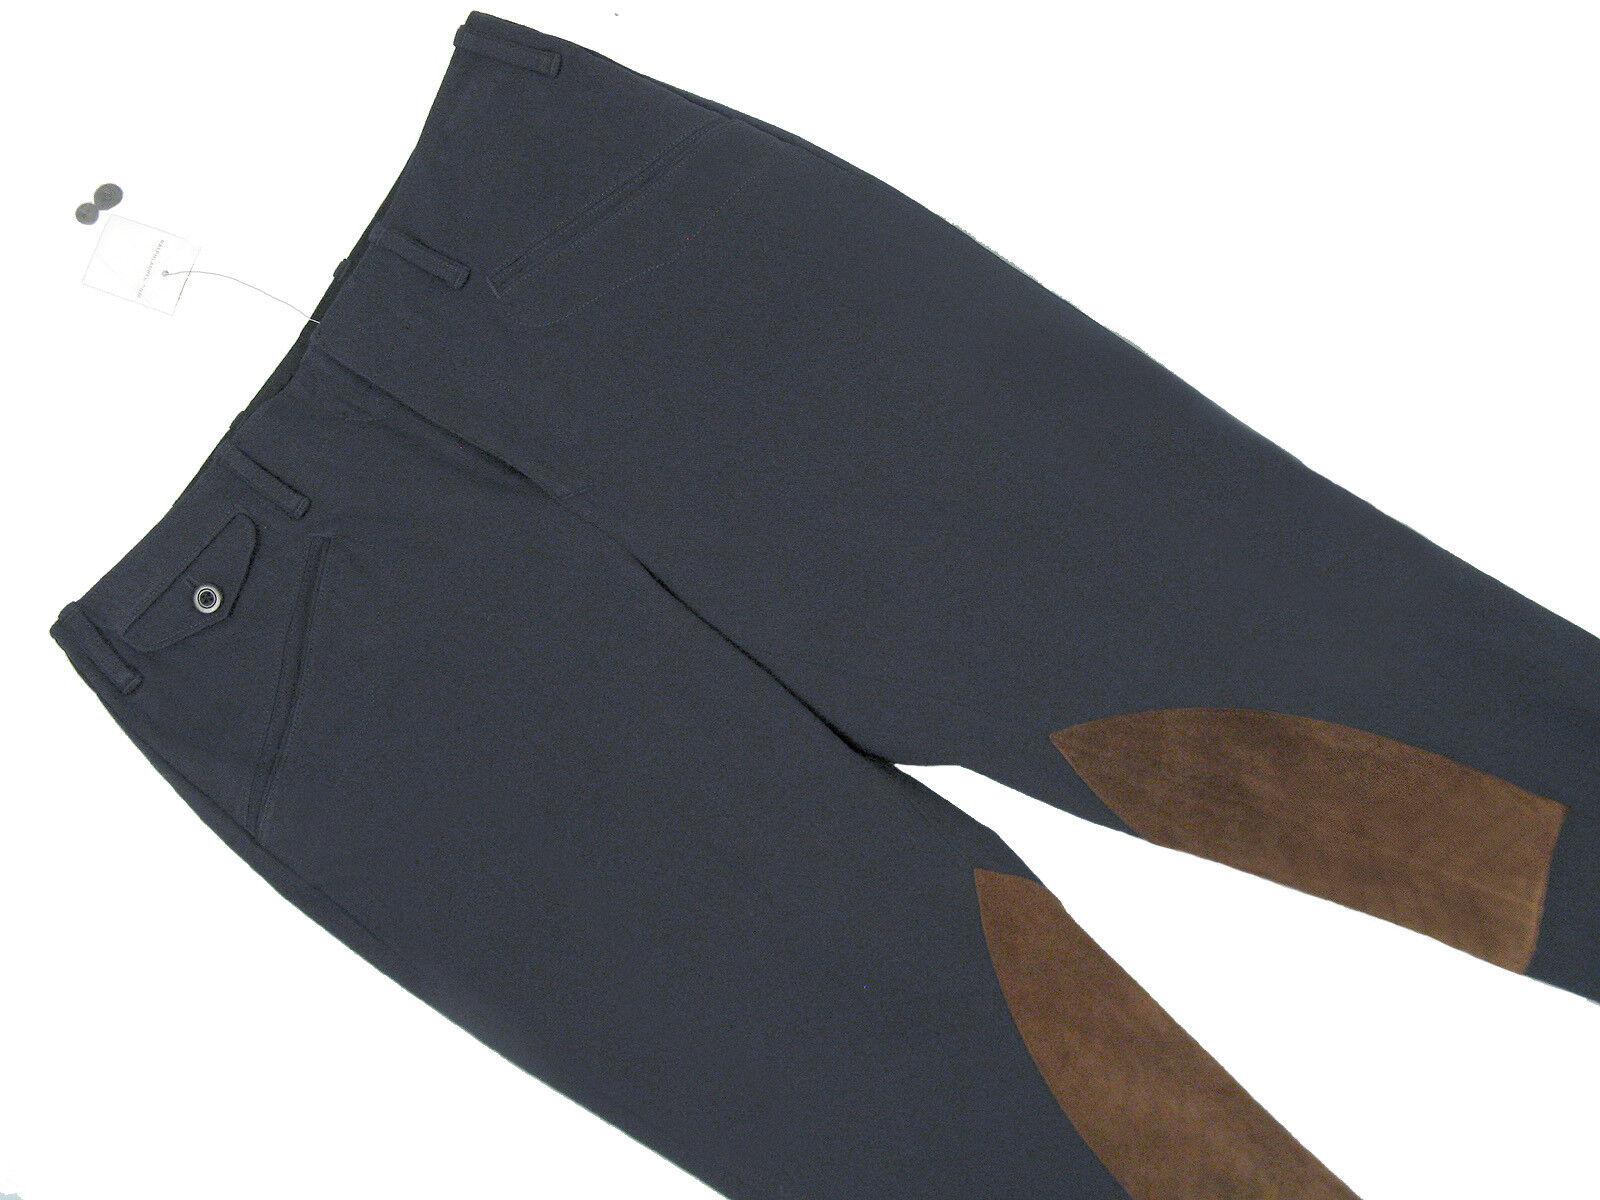 NEW  Polo Ralph Lauren damen Equestrian Style Pants (Jodhpurs)   Blau or Tan